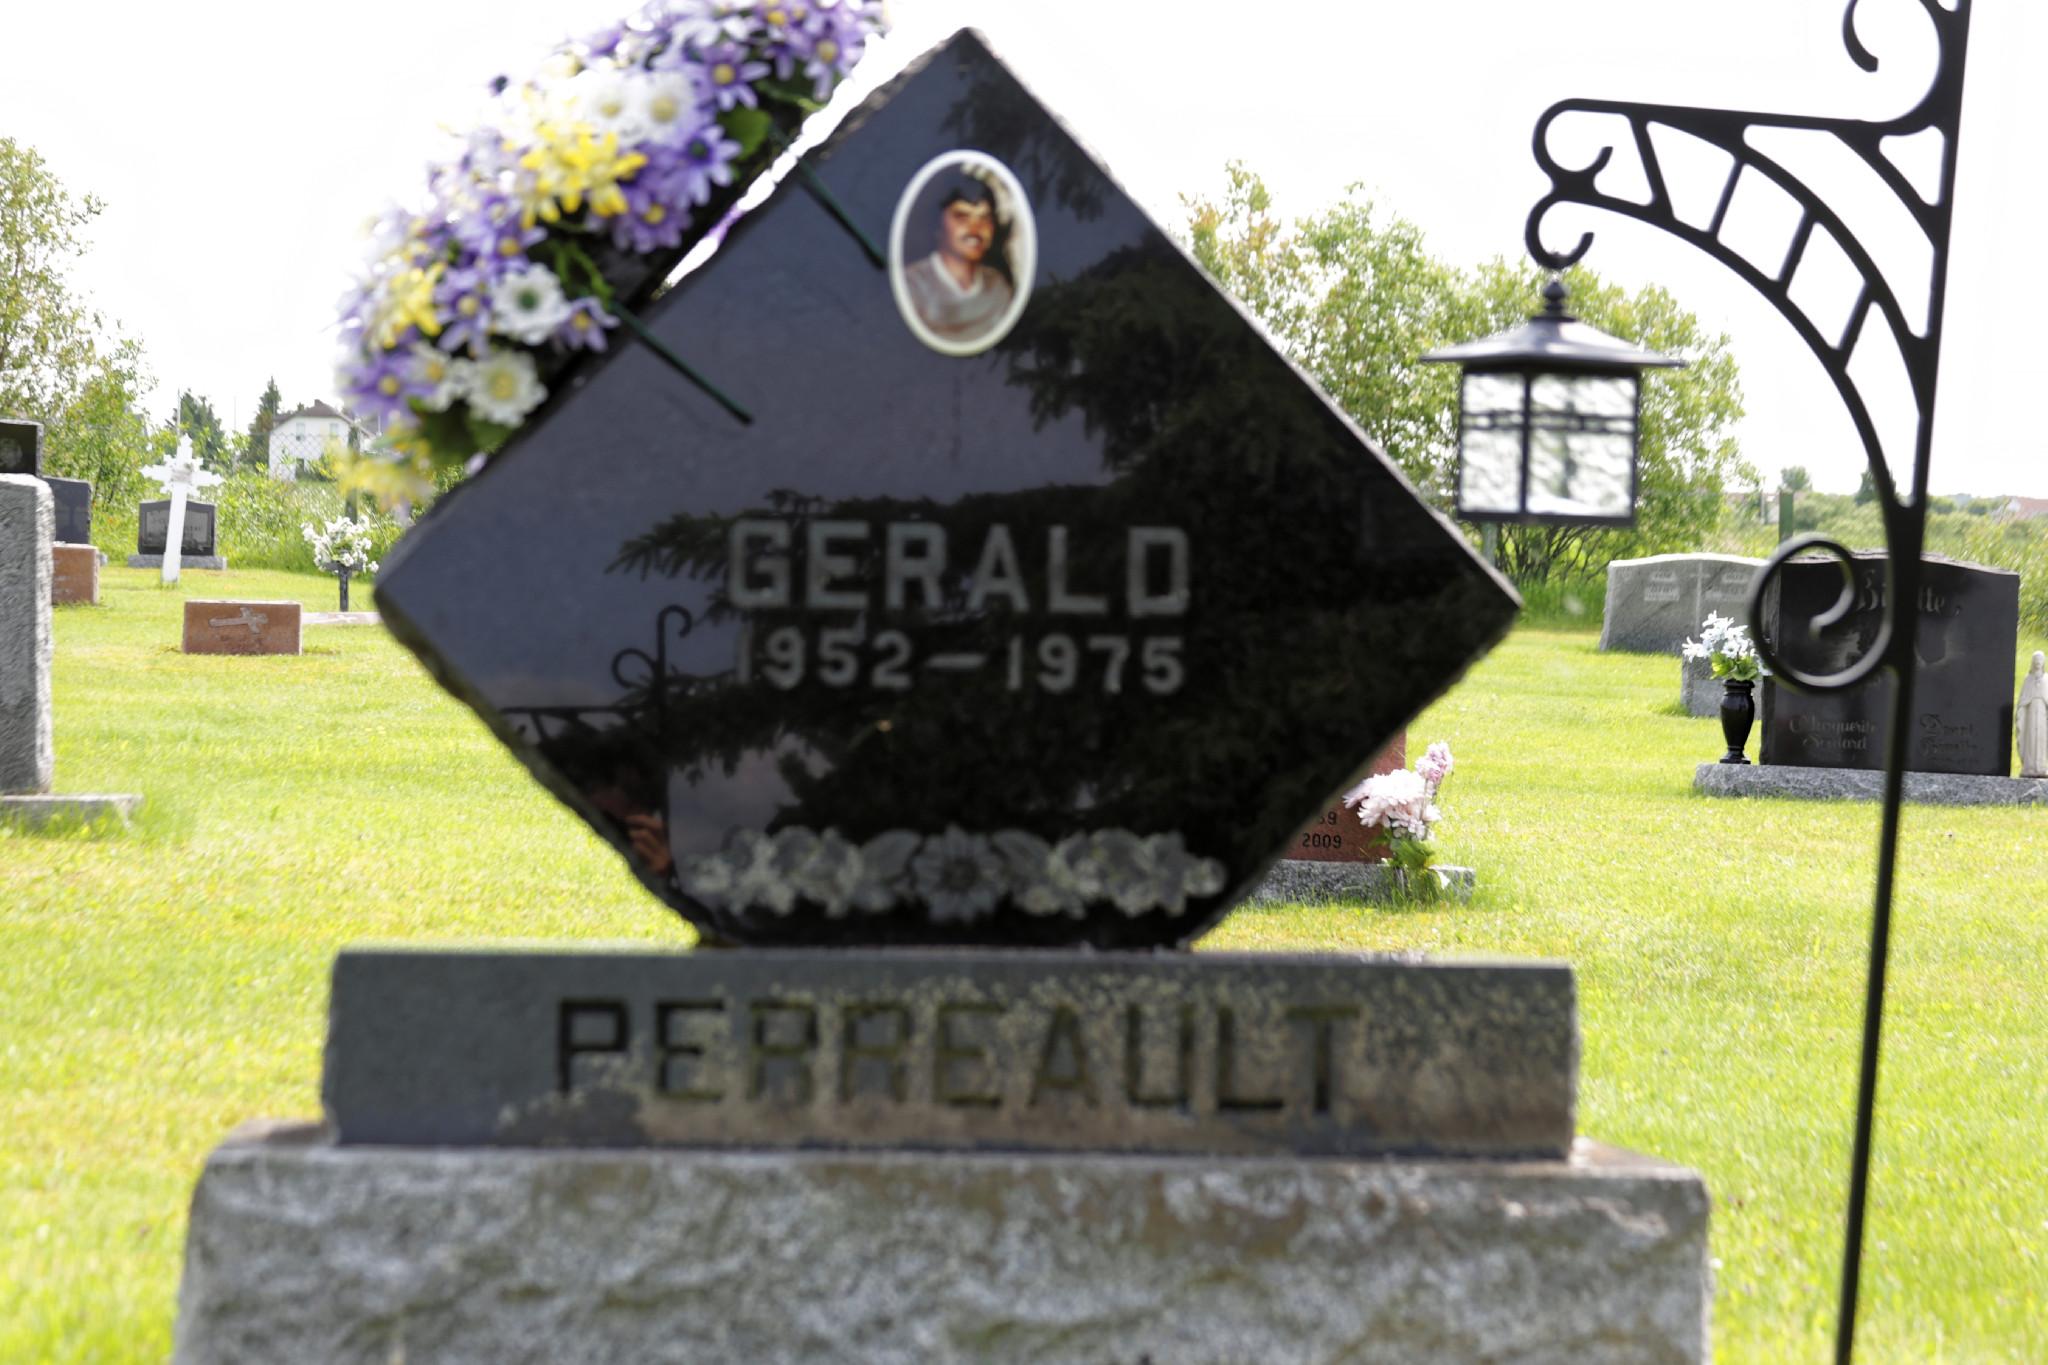 Gérald Perreault